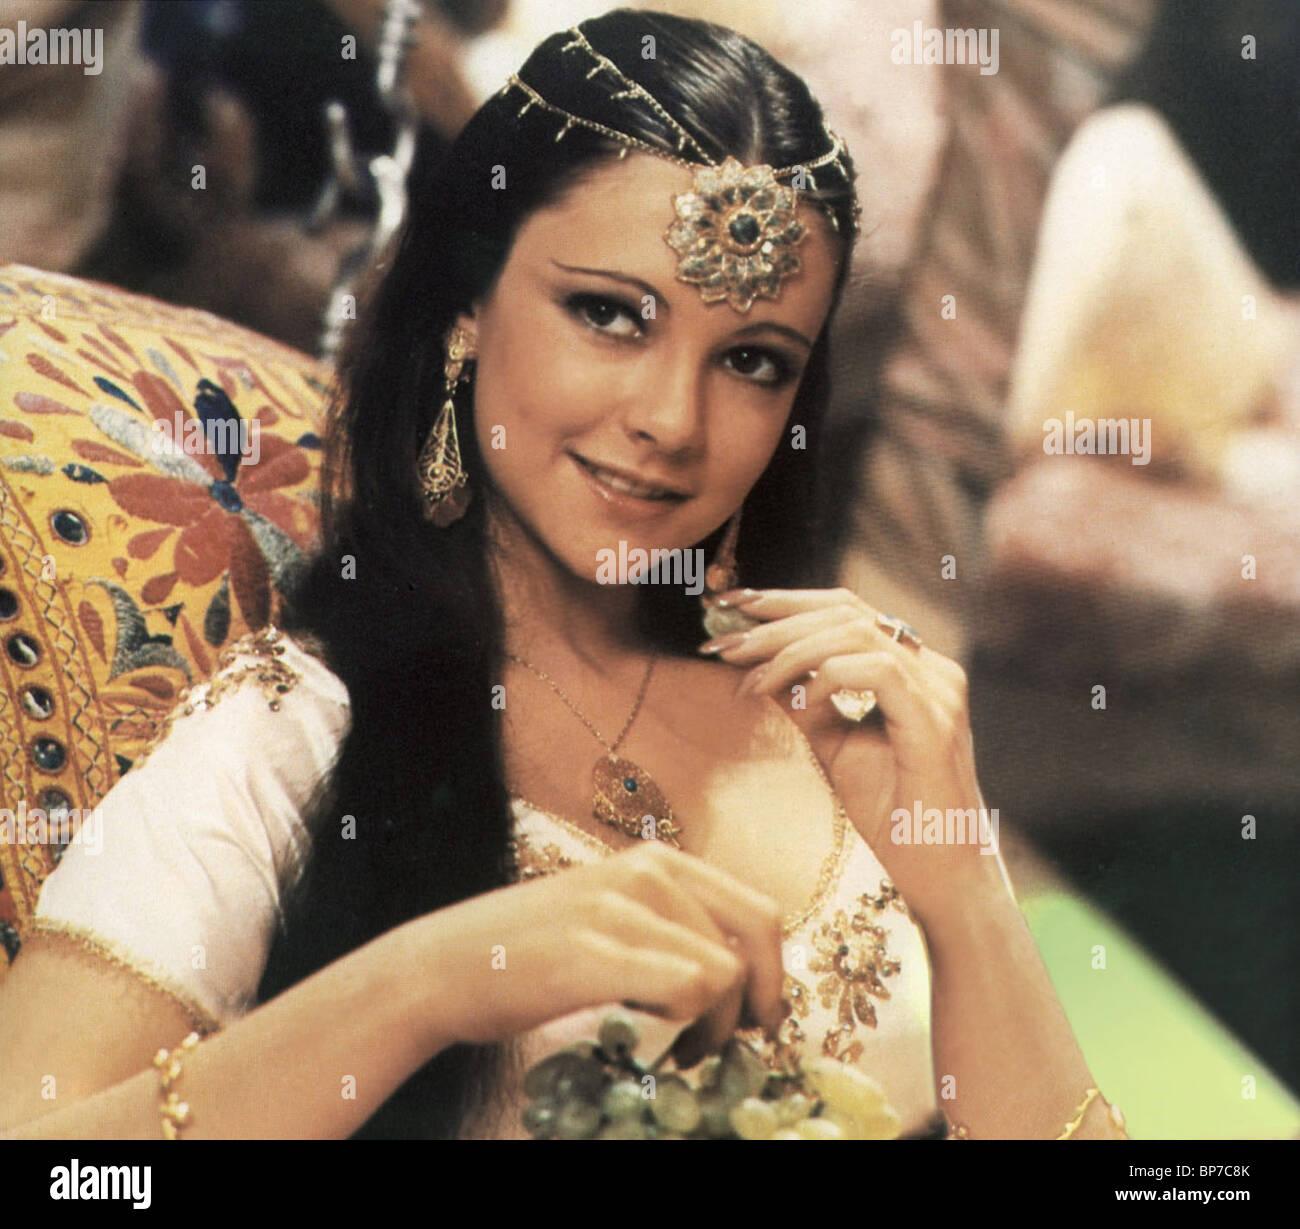 from Malachi nude arabian princess images